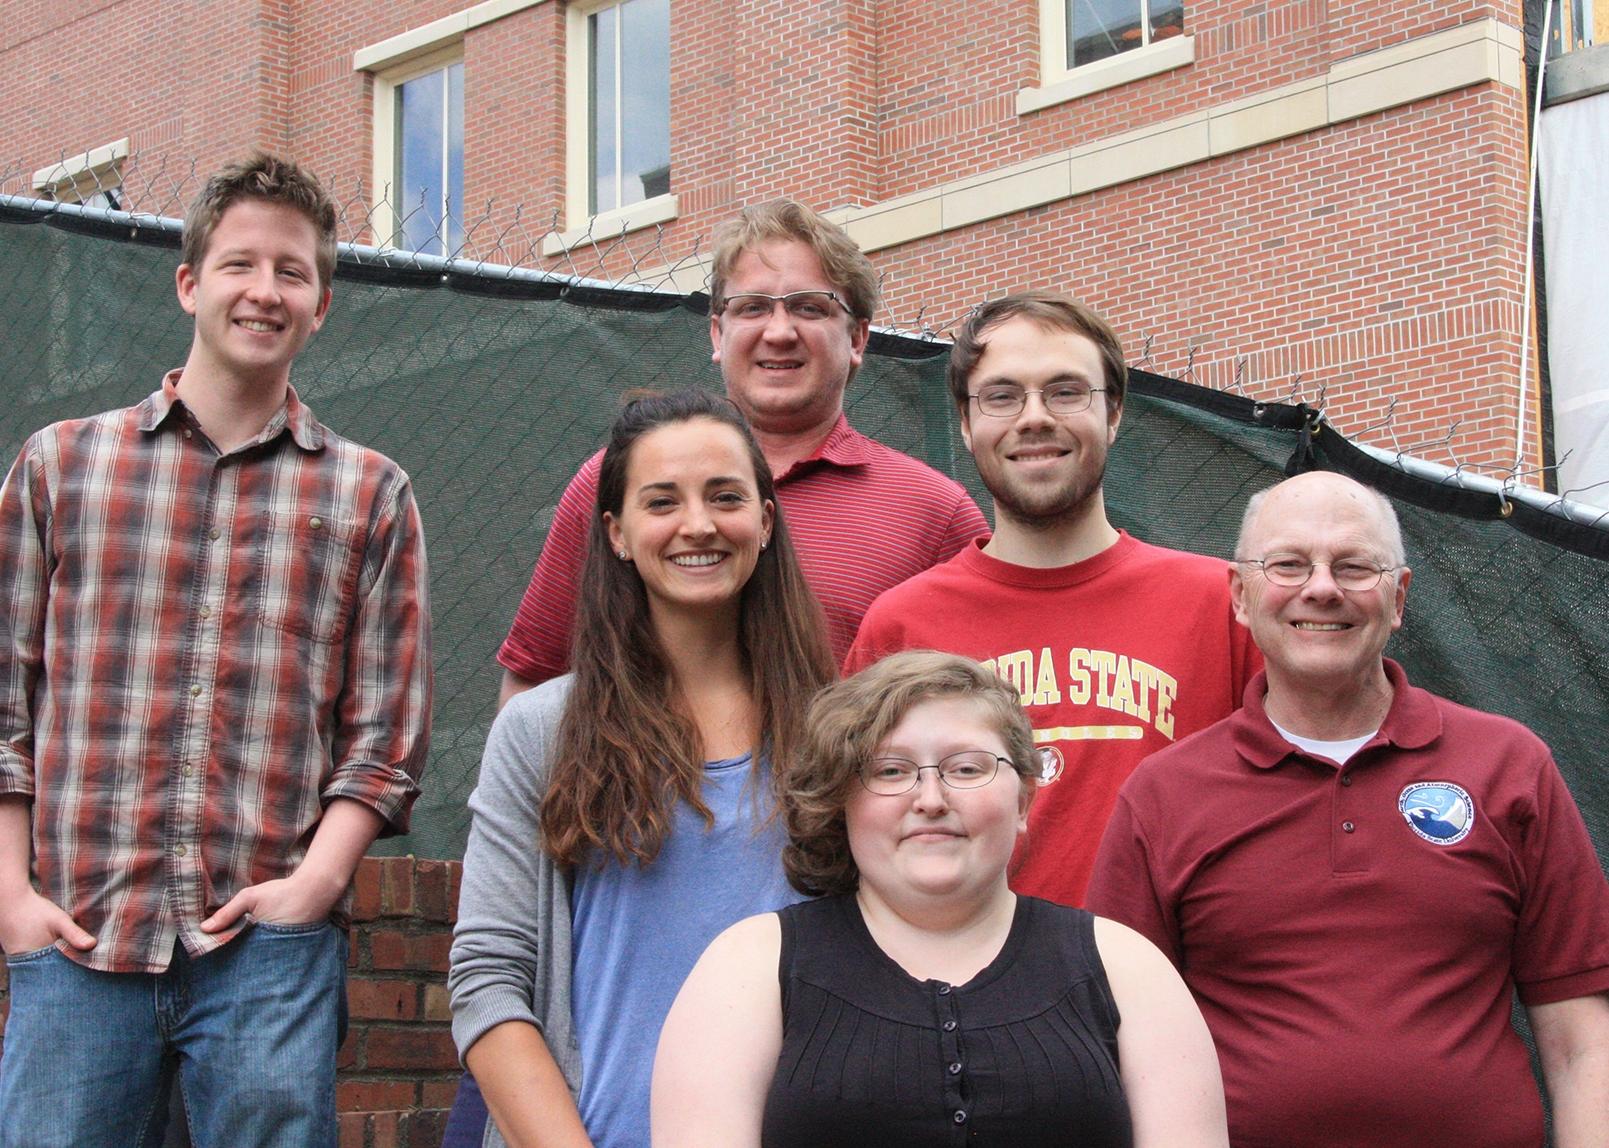 Front: Chesnea Skeen - Middle: Amanda Sava, Will Curtis, Henry Fuelberg - Back: Thomas Gard, Charlie Bowen